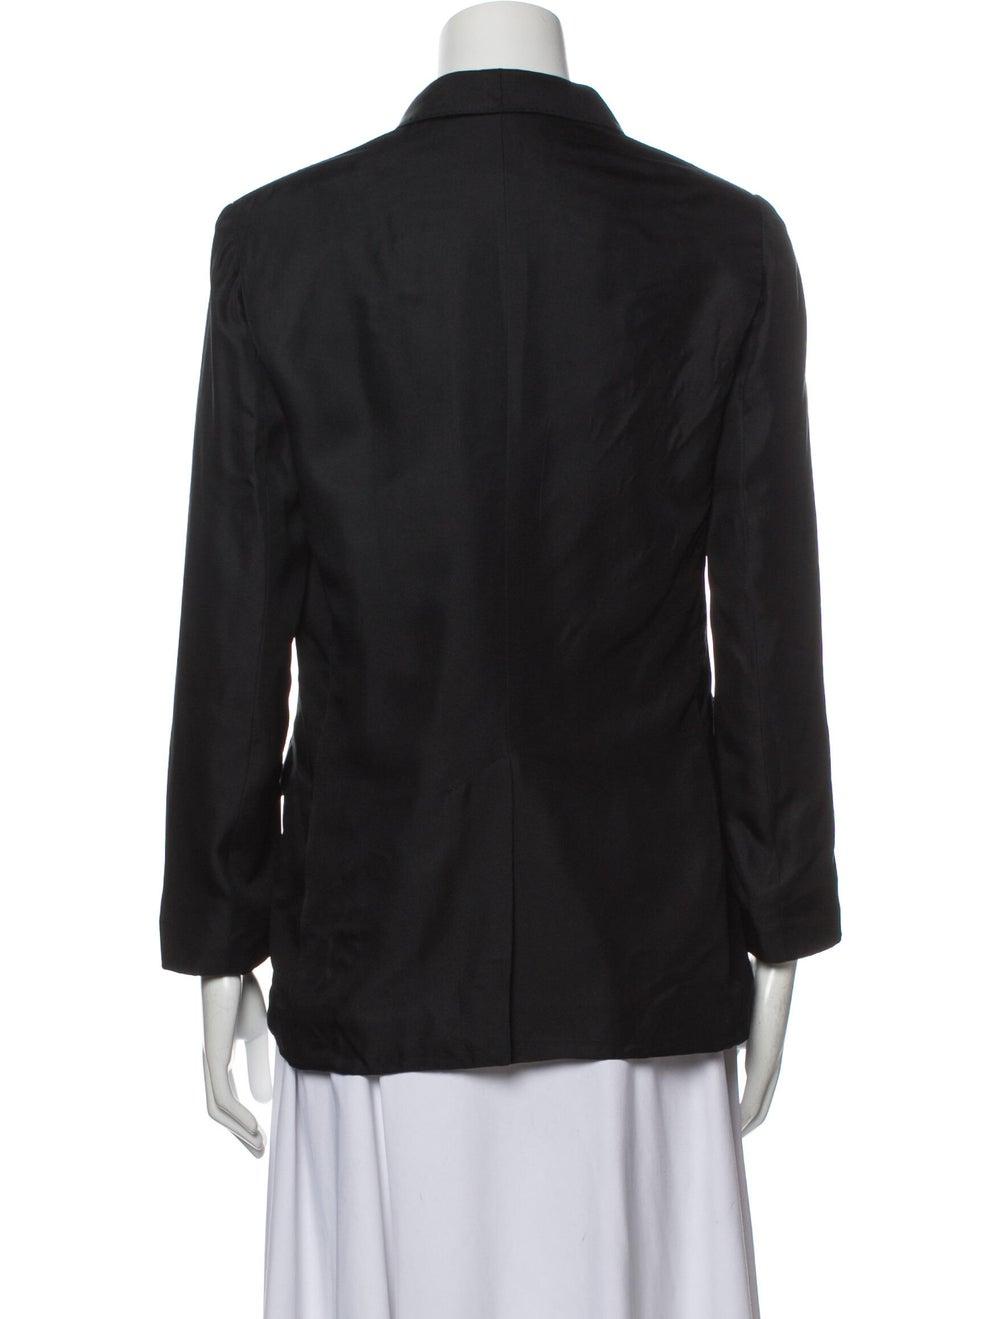 Rag & Bone Silk Blazer Black - image 3